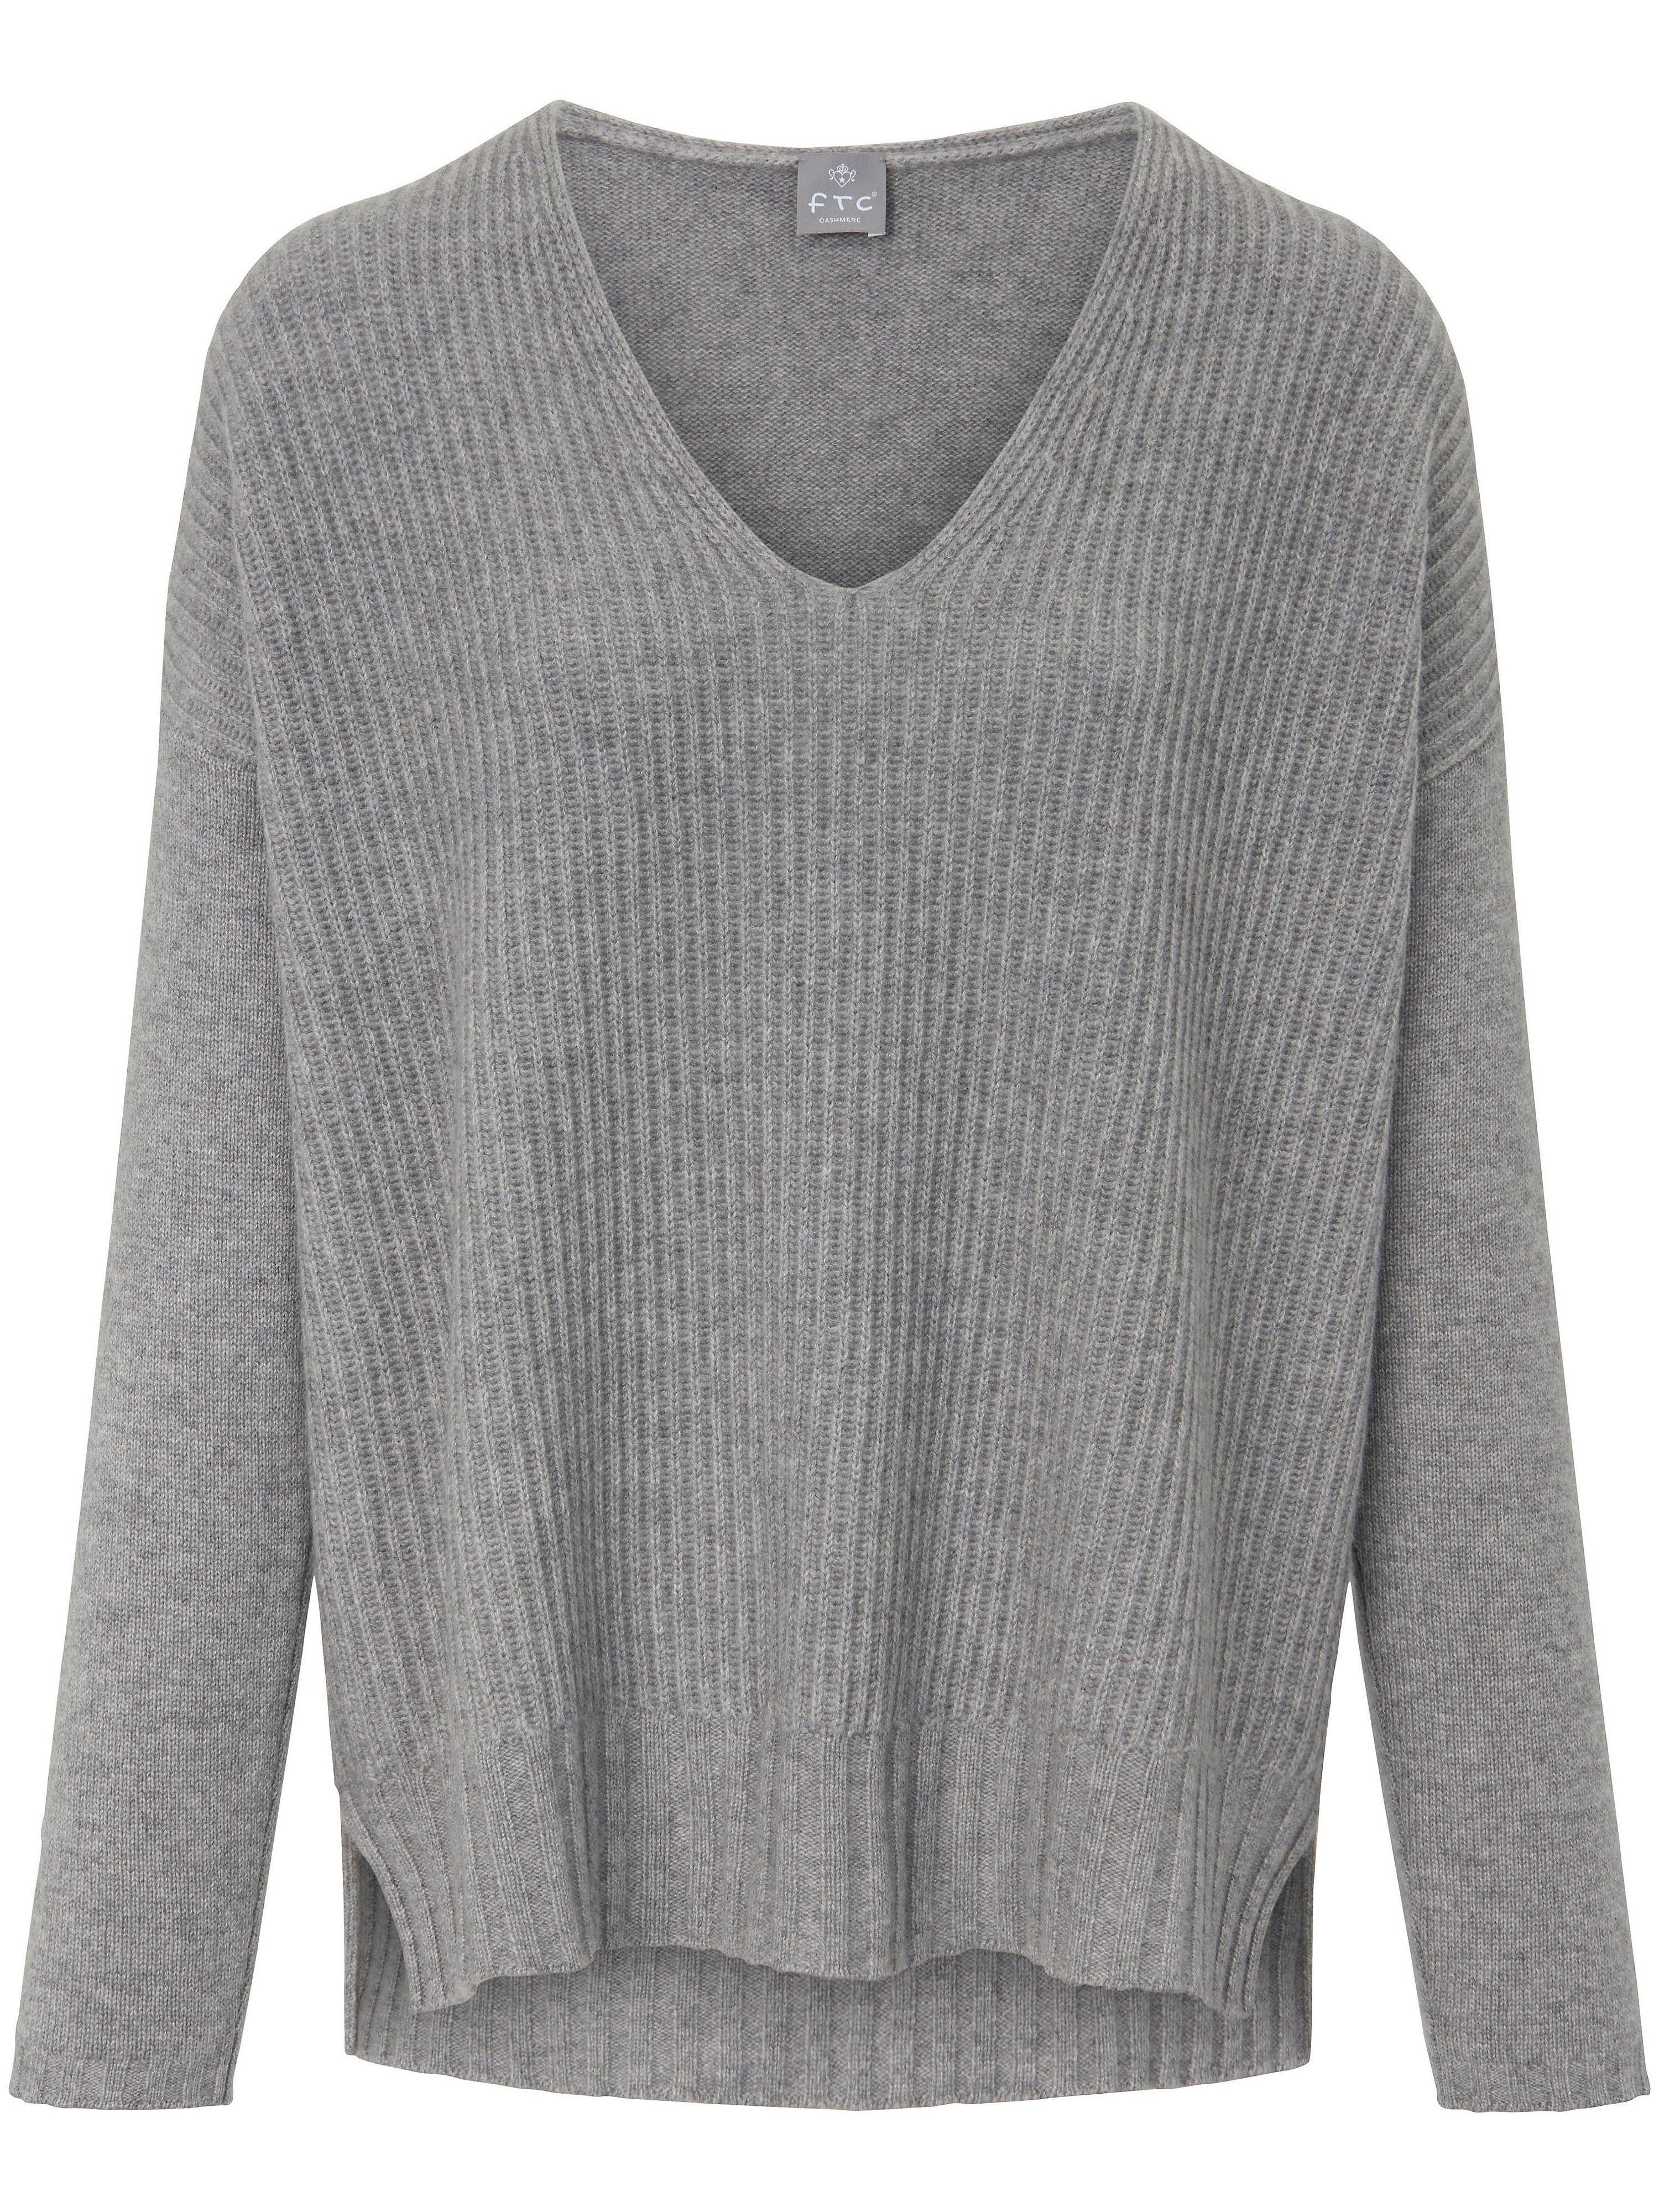 FTC Cashmere V-ringad tröja i 100% kashmir från FTC Cashmere grå